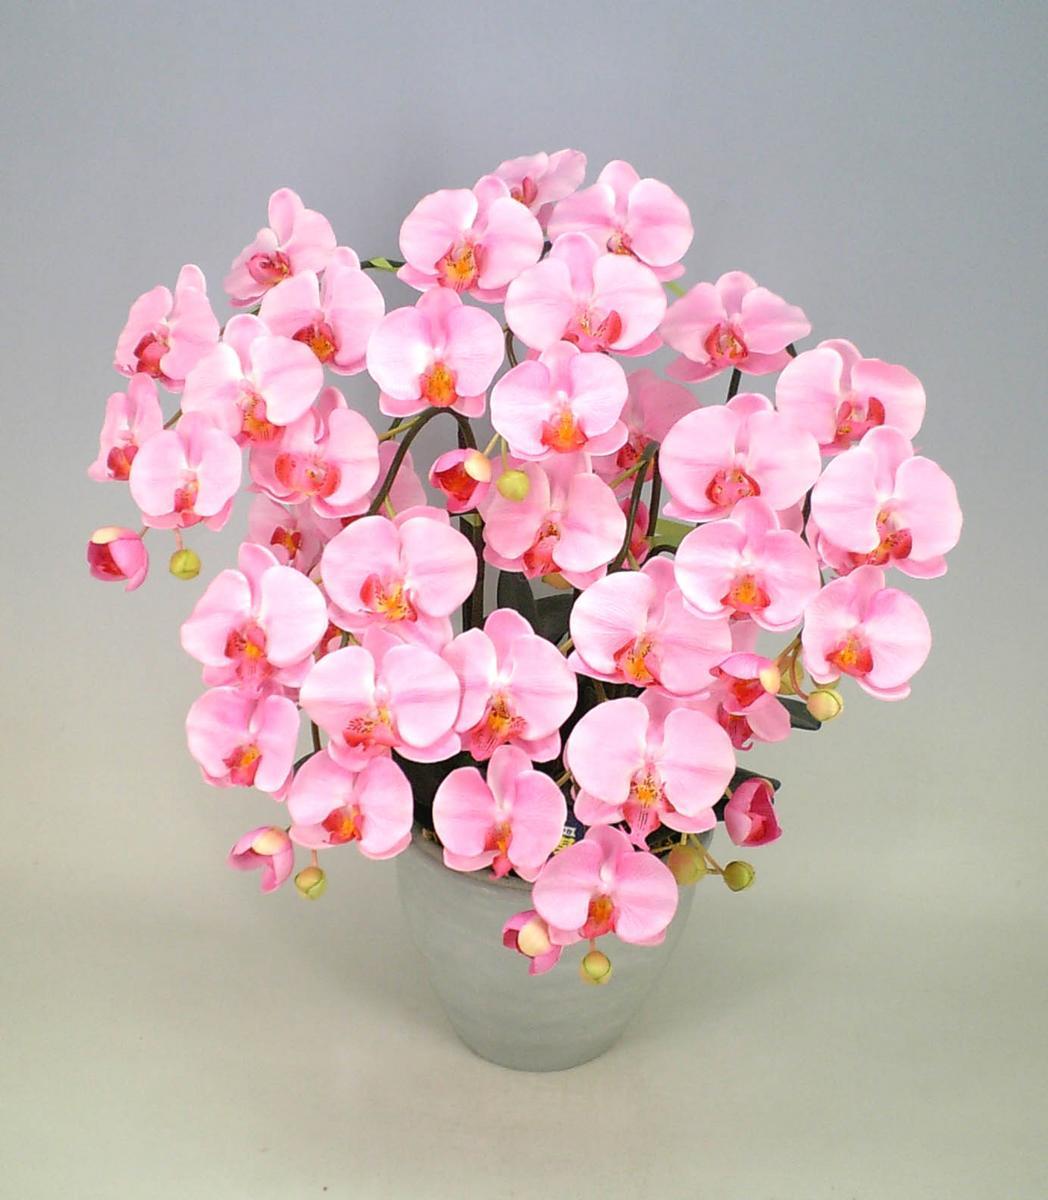 Yoran rakuten global market phalaenopsis orchid flower light pink phalaenopsis orchid flower light pink 5 stand mightylinksfo